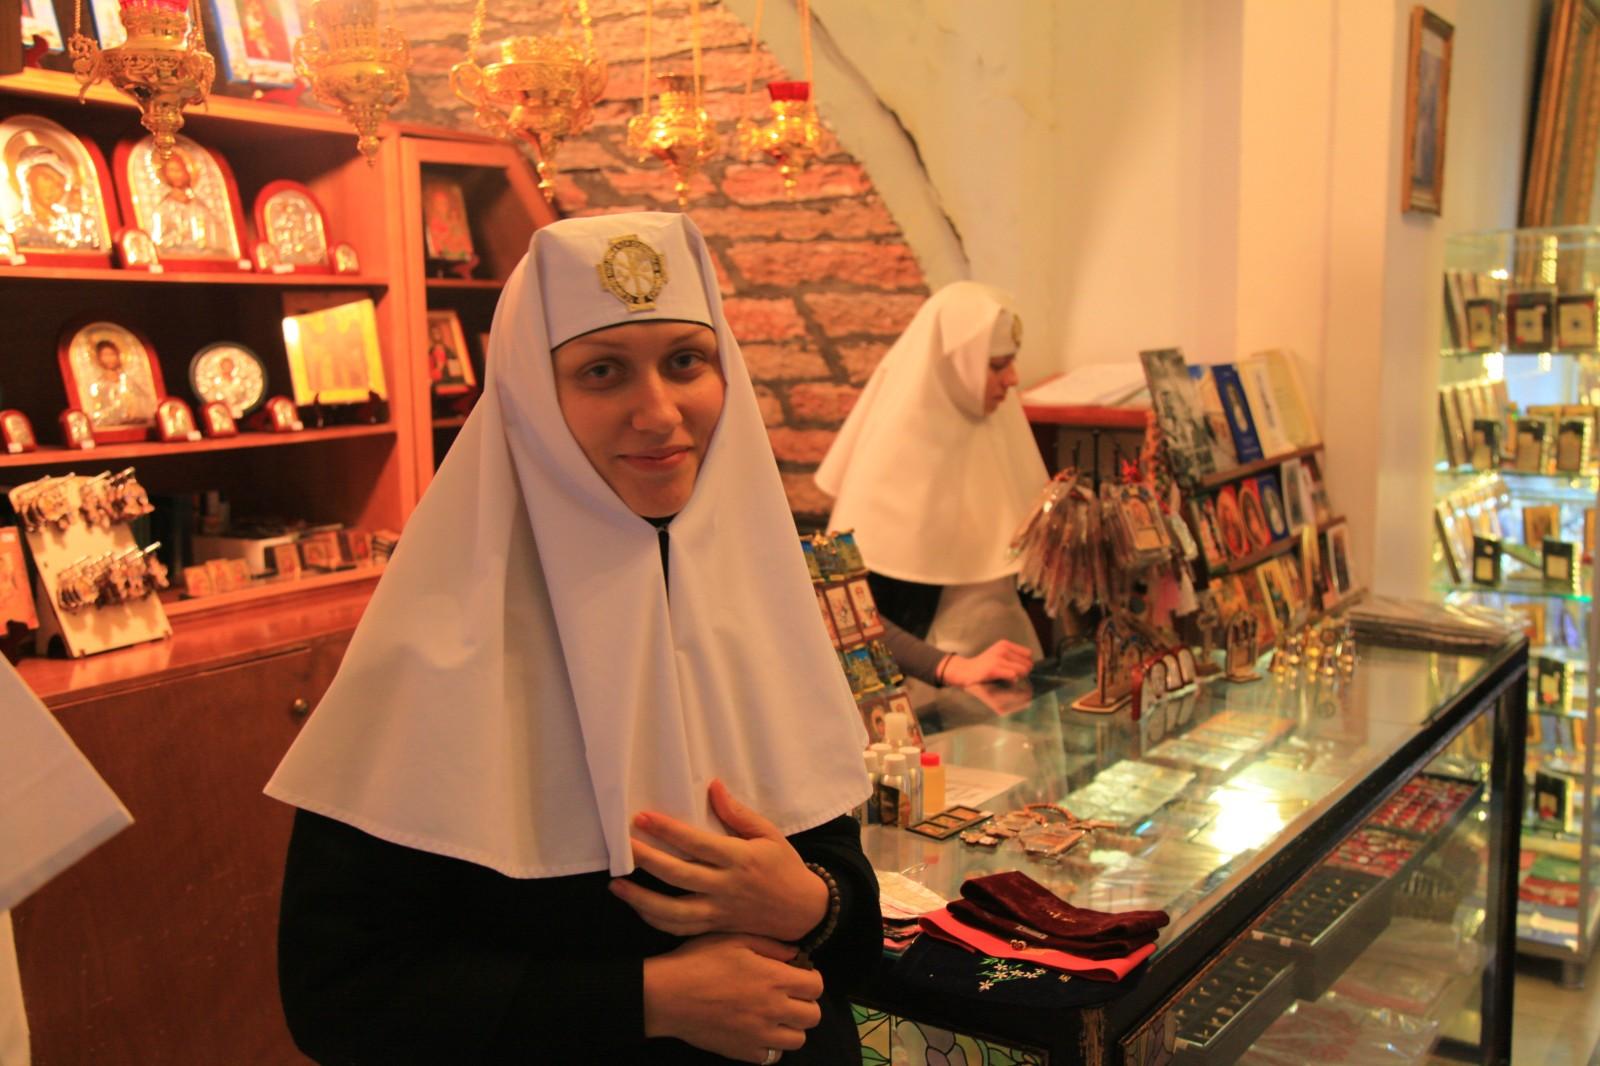 Orthodox nuns from Ukraine